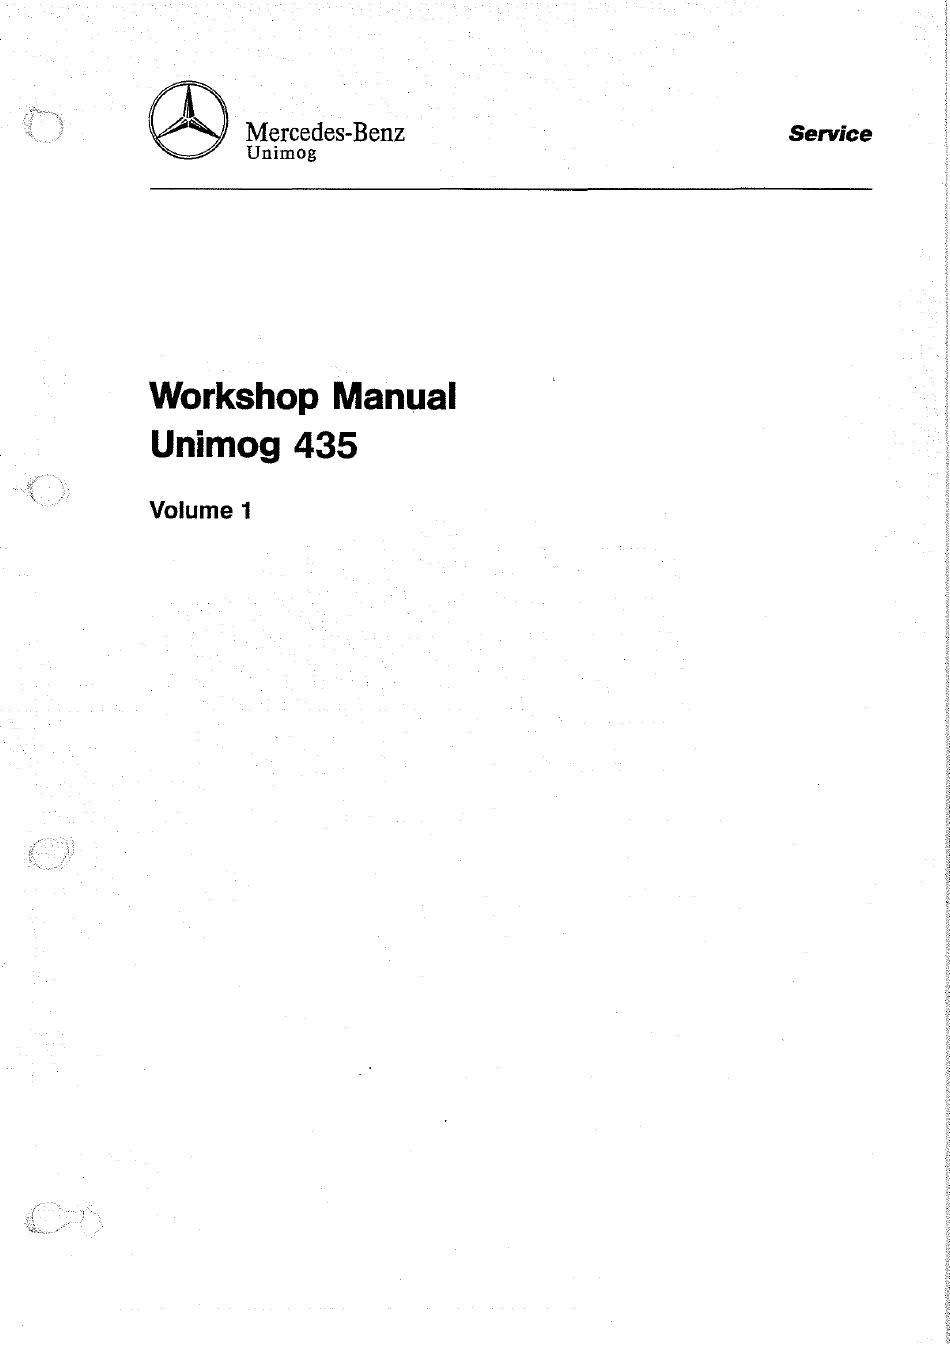 UNIMOG manuale di istruzioni Unimog 437-12.88